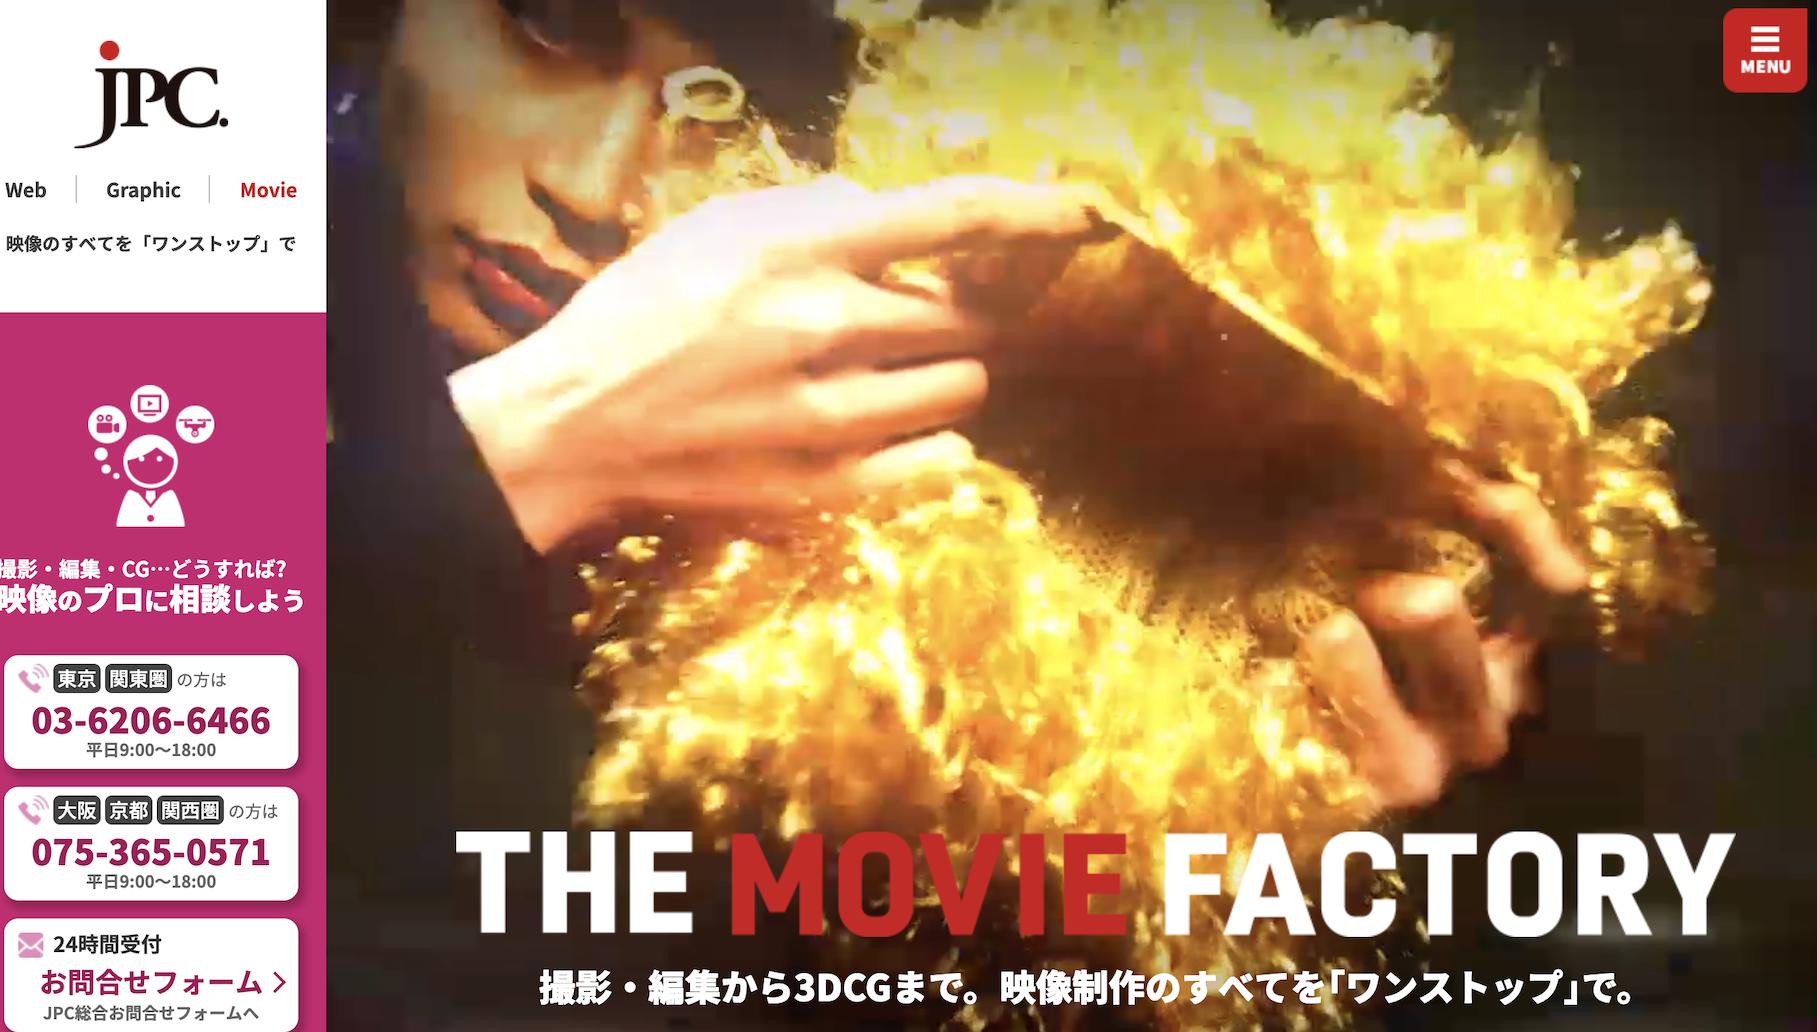 THE MOVIE FACTORY_キャプチャ